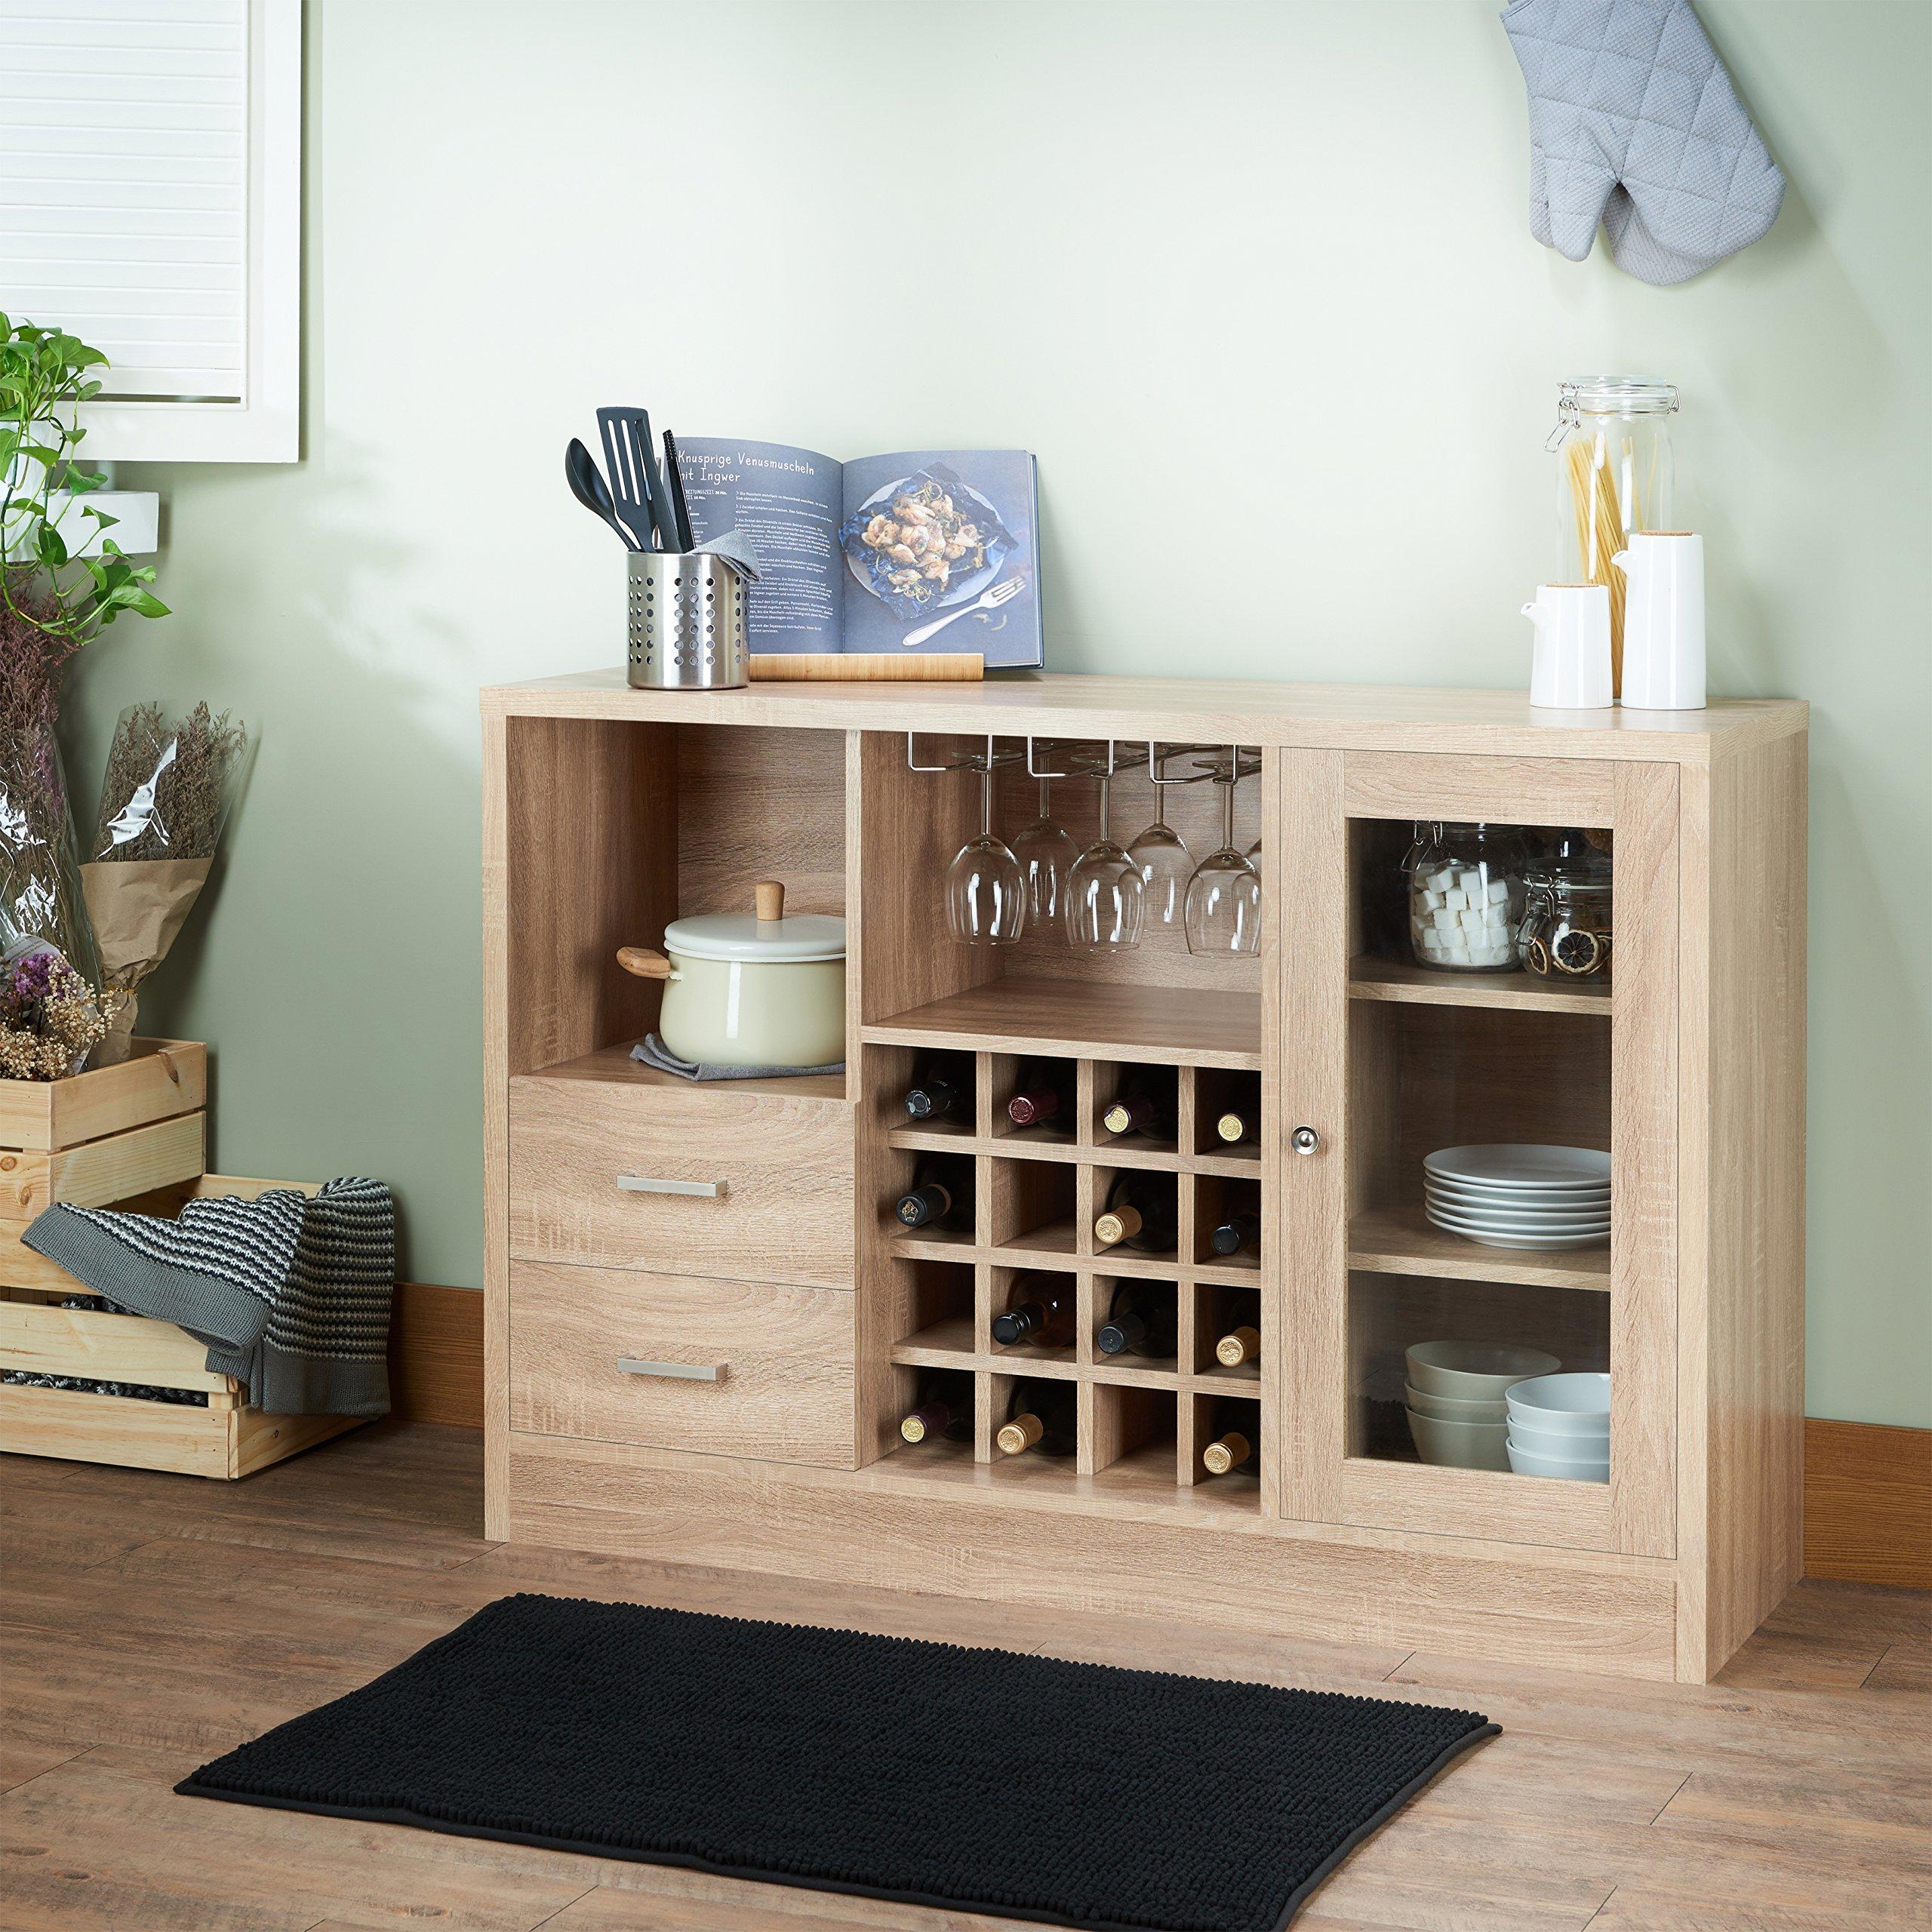 Acme Furniture 72635 Joice Rustic Oak Server by Acme Furniture (Image #8)